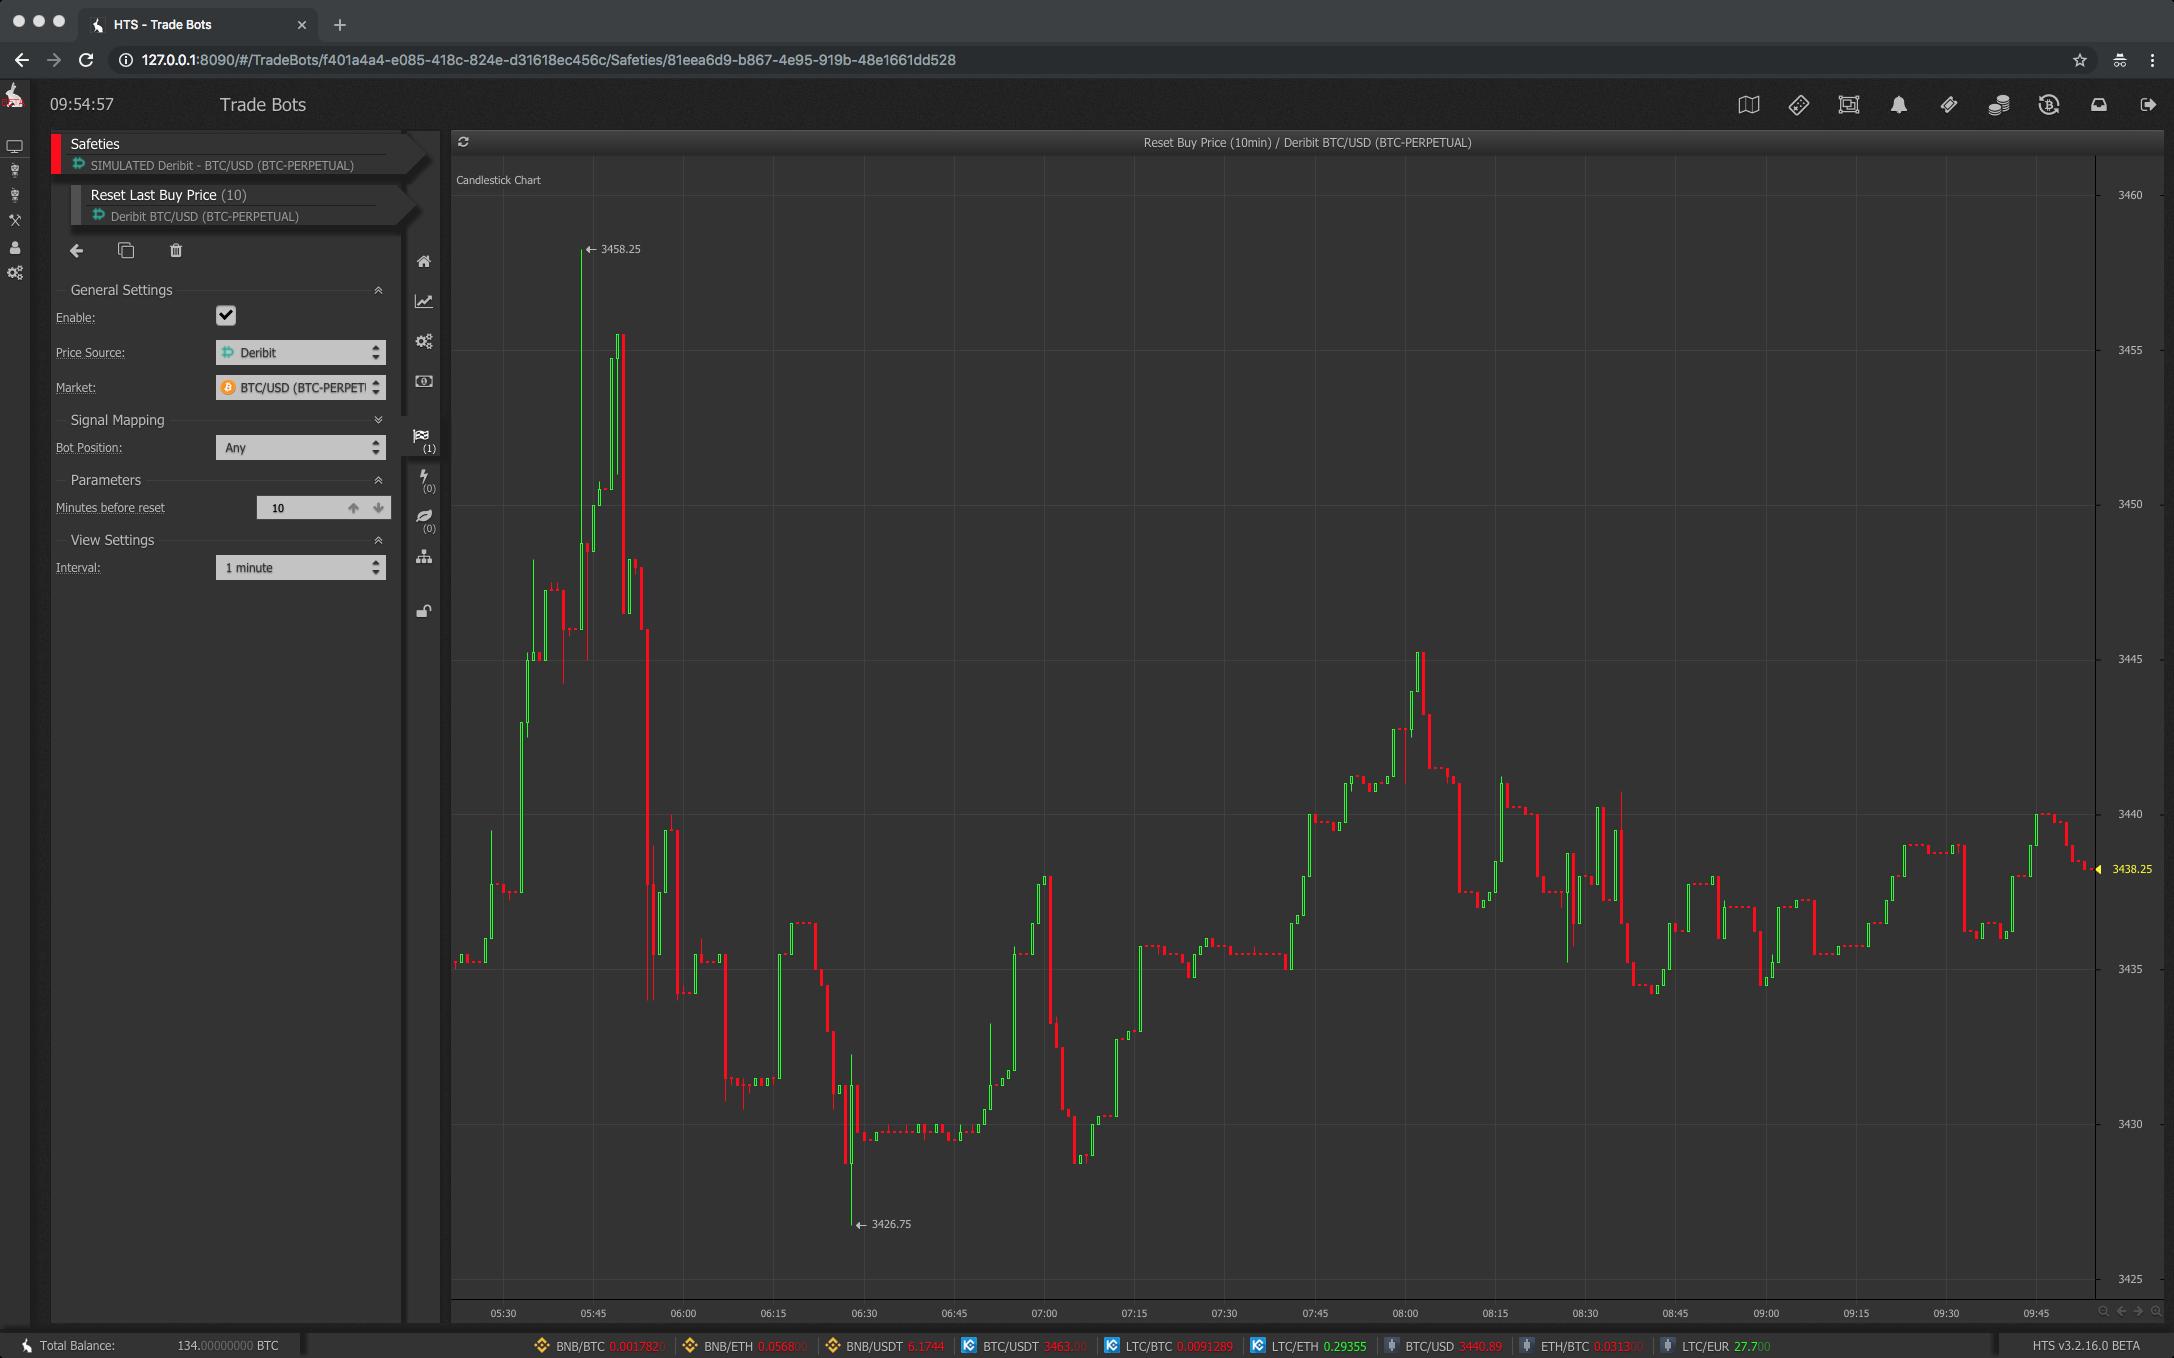 reset last buy price haasbot safety